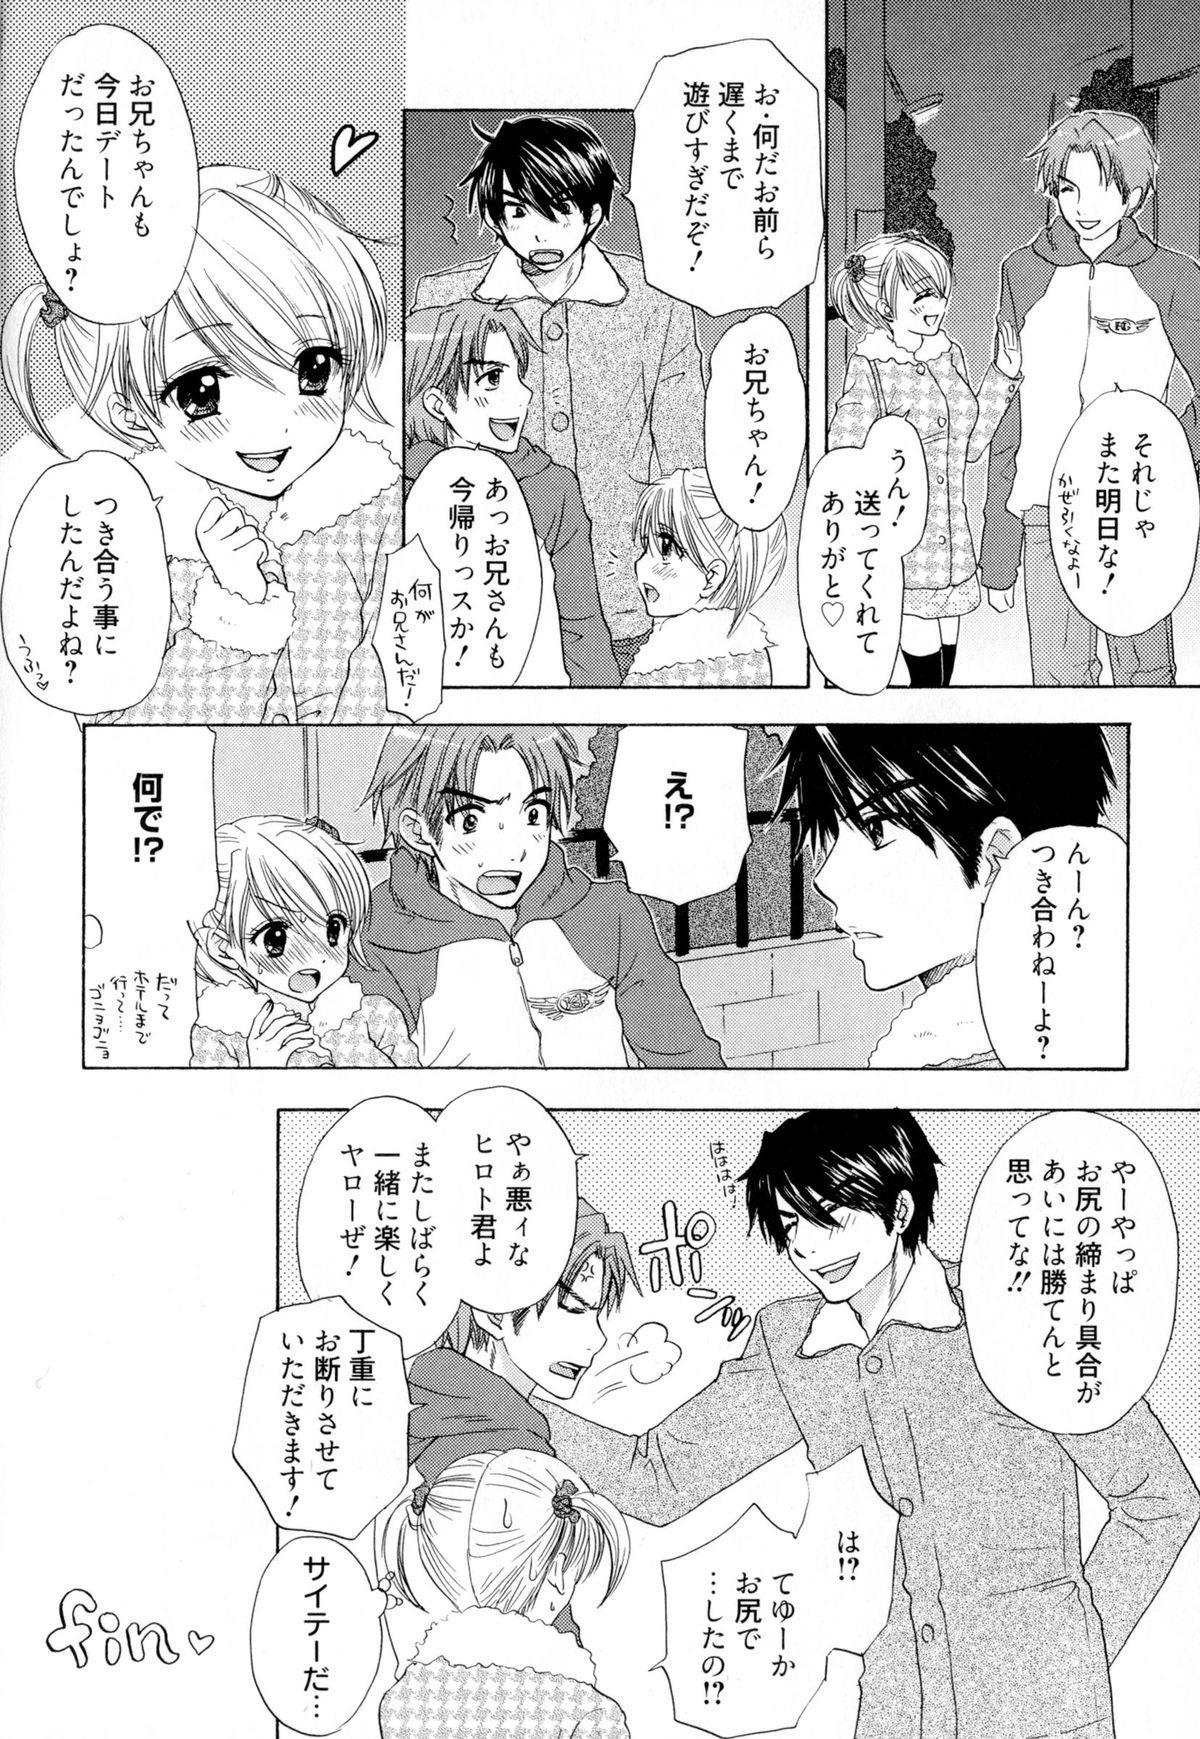 The Great Escape 4 Shokai Genteiban 35